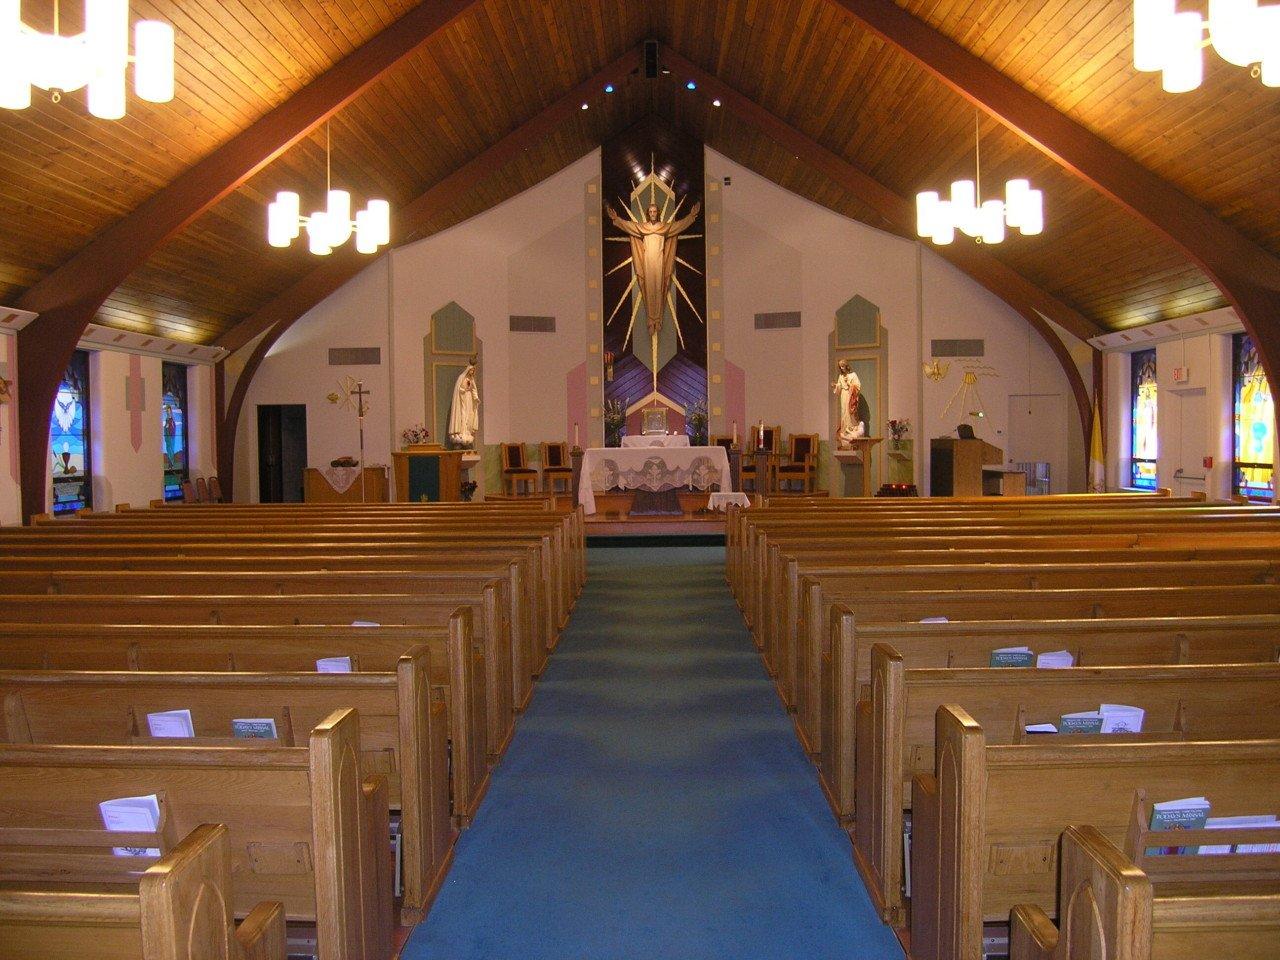 Case study custom church lighting artech church interiors for Artech custom home designs